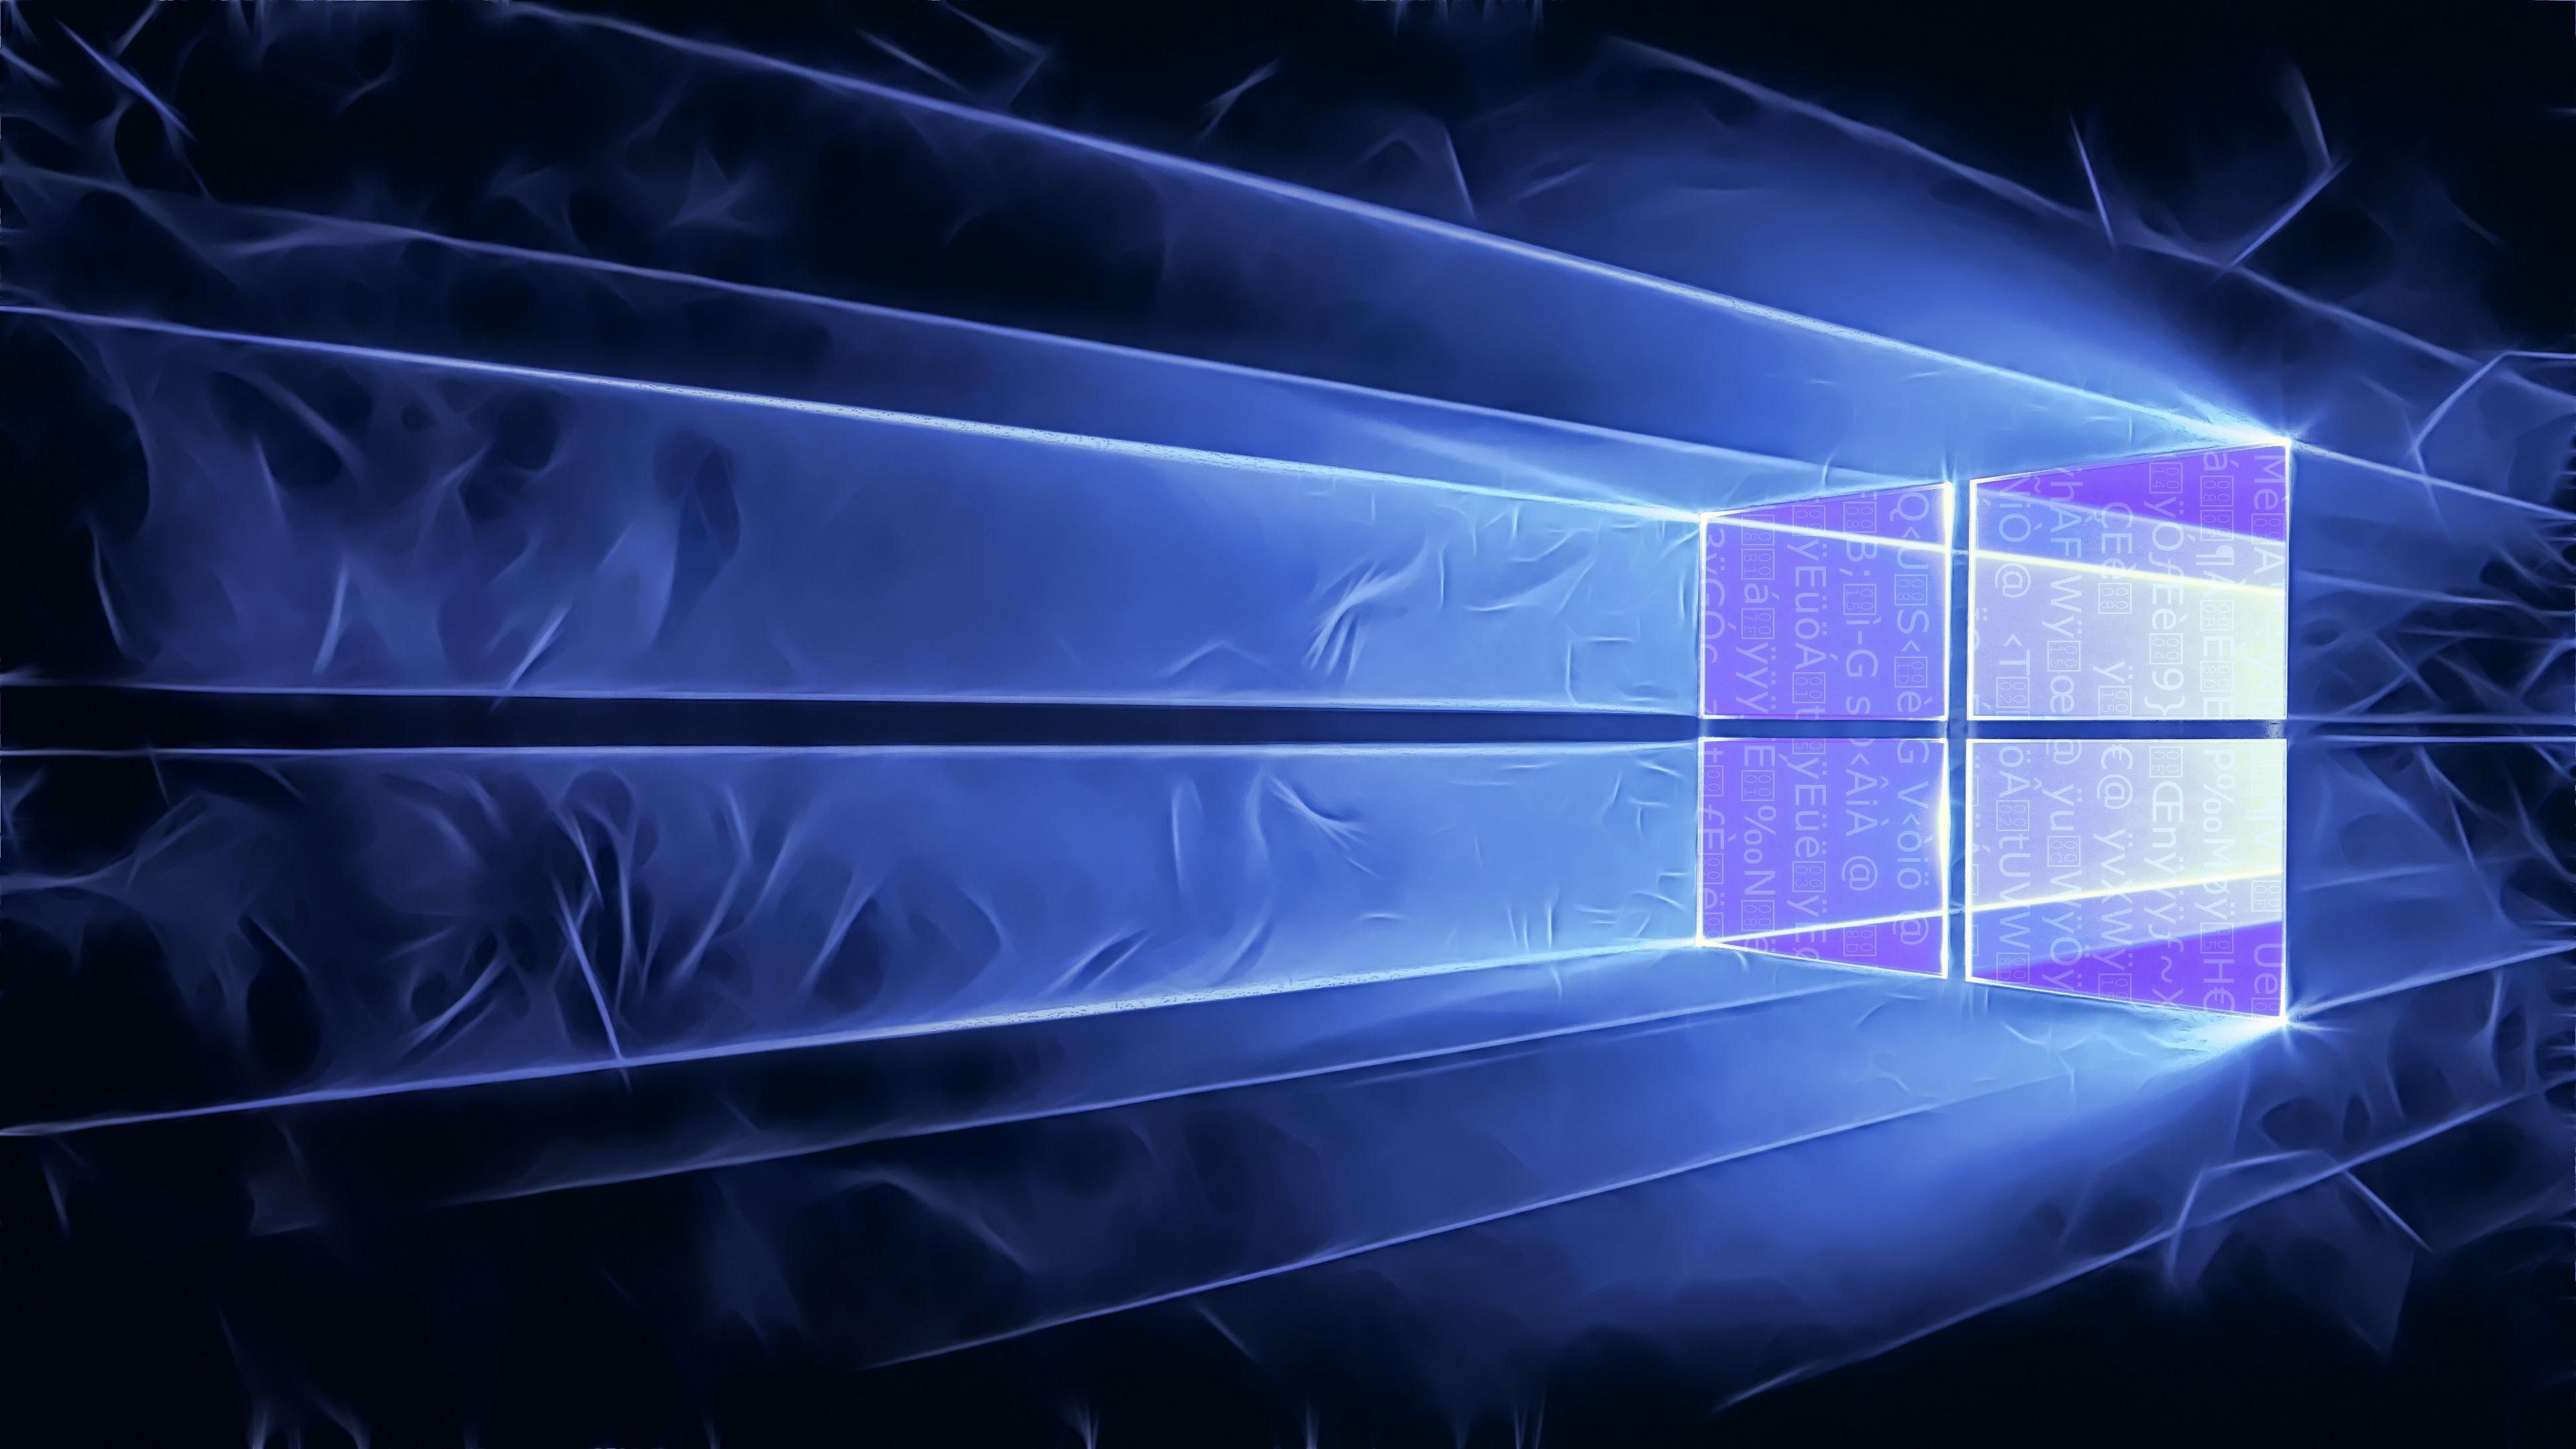 Windows 10 Desktop Background Windows 10 Desktop Backgrounds Wallpaper Windows 10 Windows 10 Background